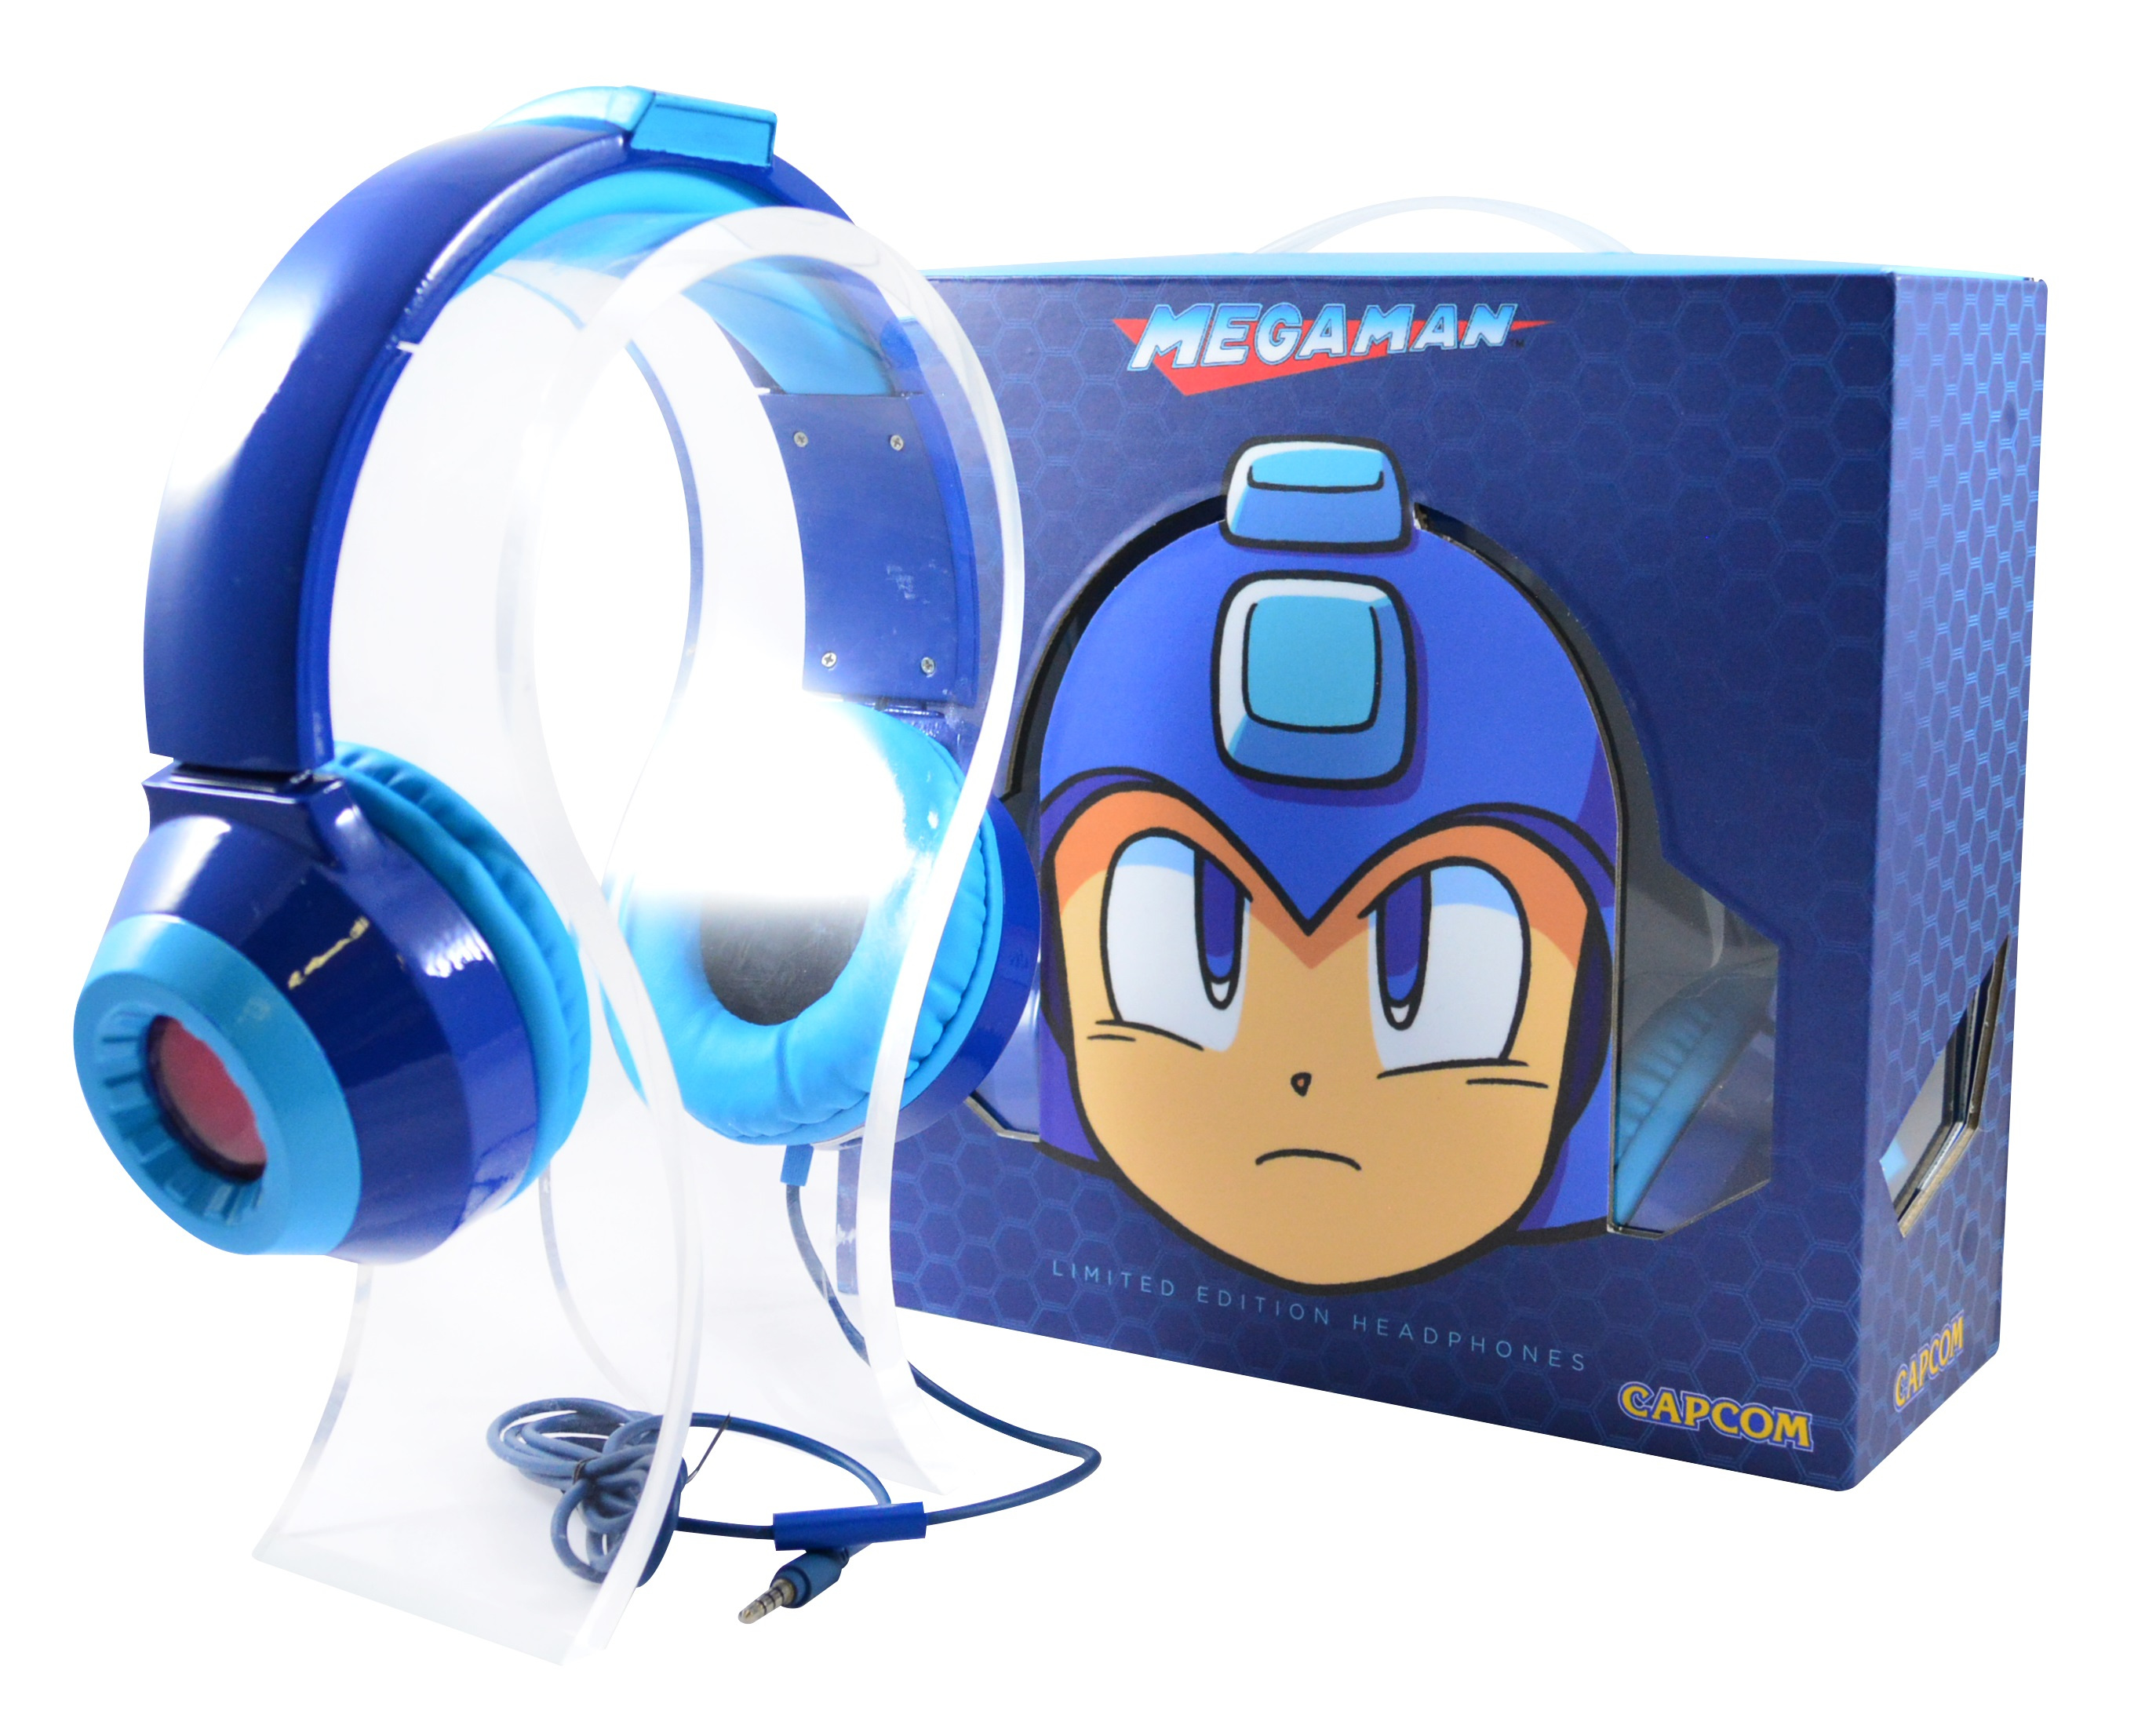 3c0a2b67b1e Random: Check Out the Official Mega Man Headphones - Nintendo Life